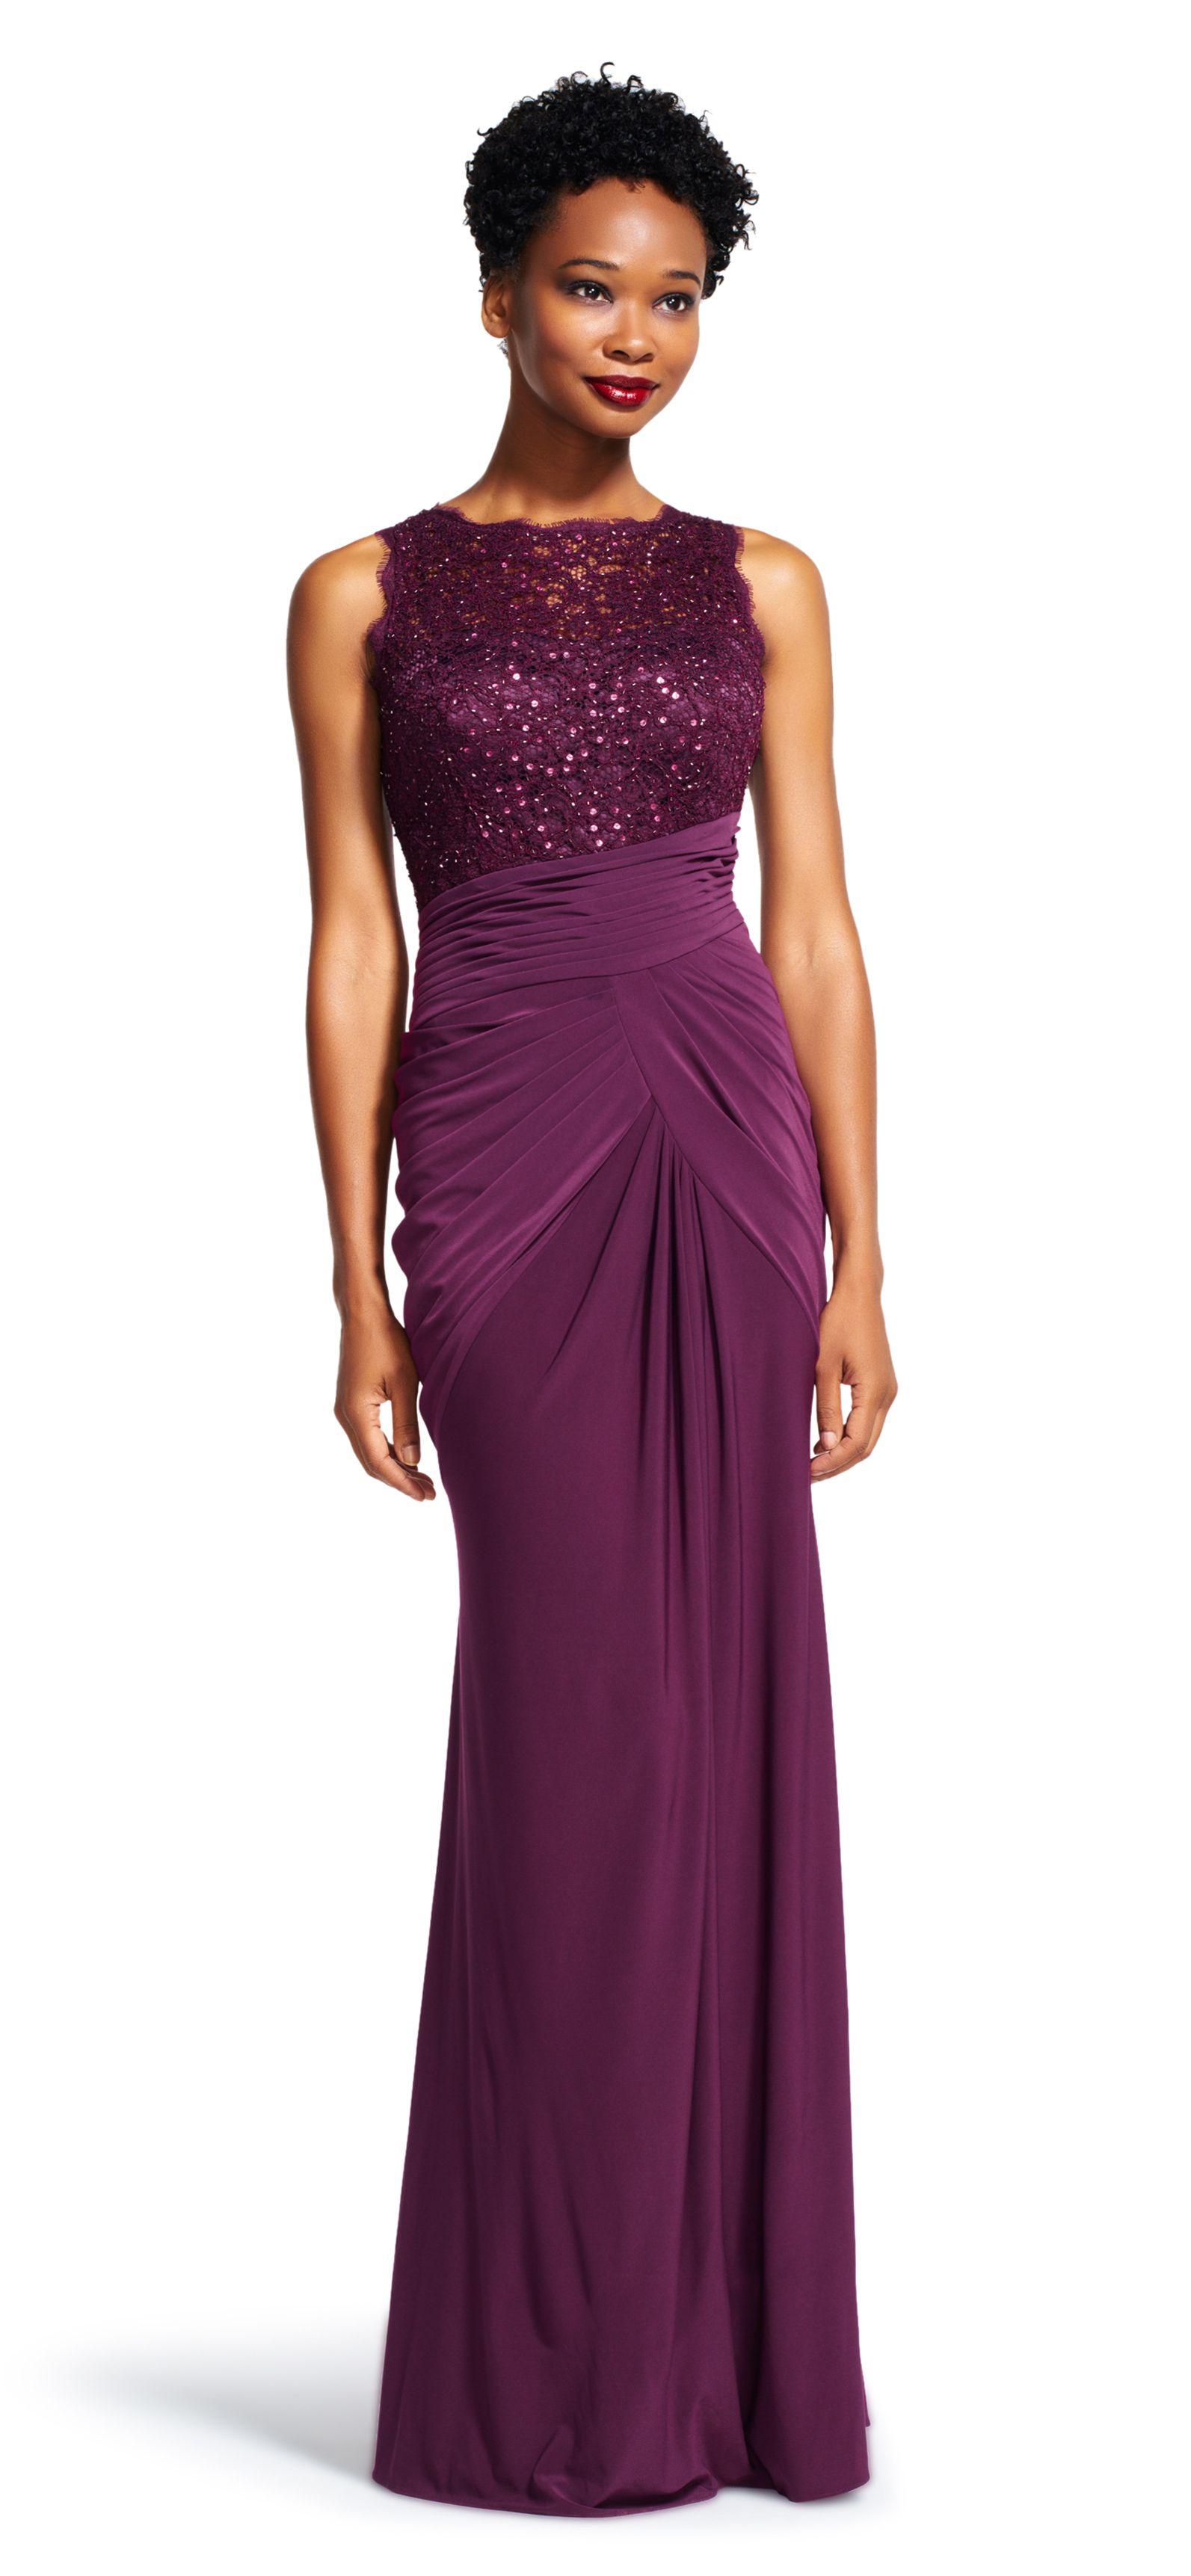 Sleeveless Draped Dress with Sequin Lace Bodice | Petite sizes ...